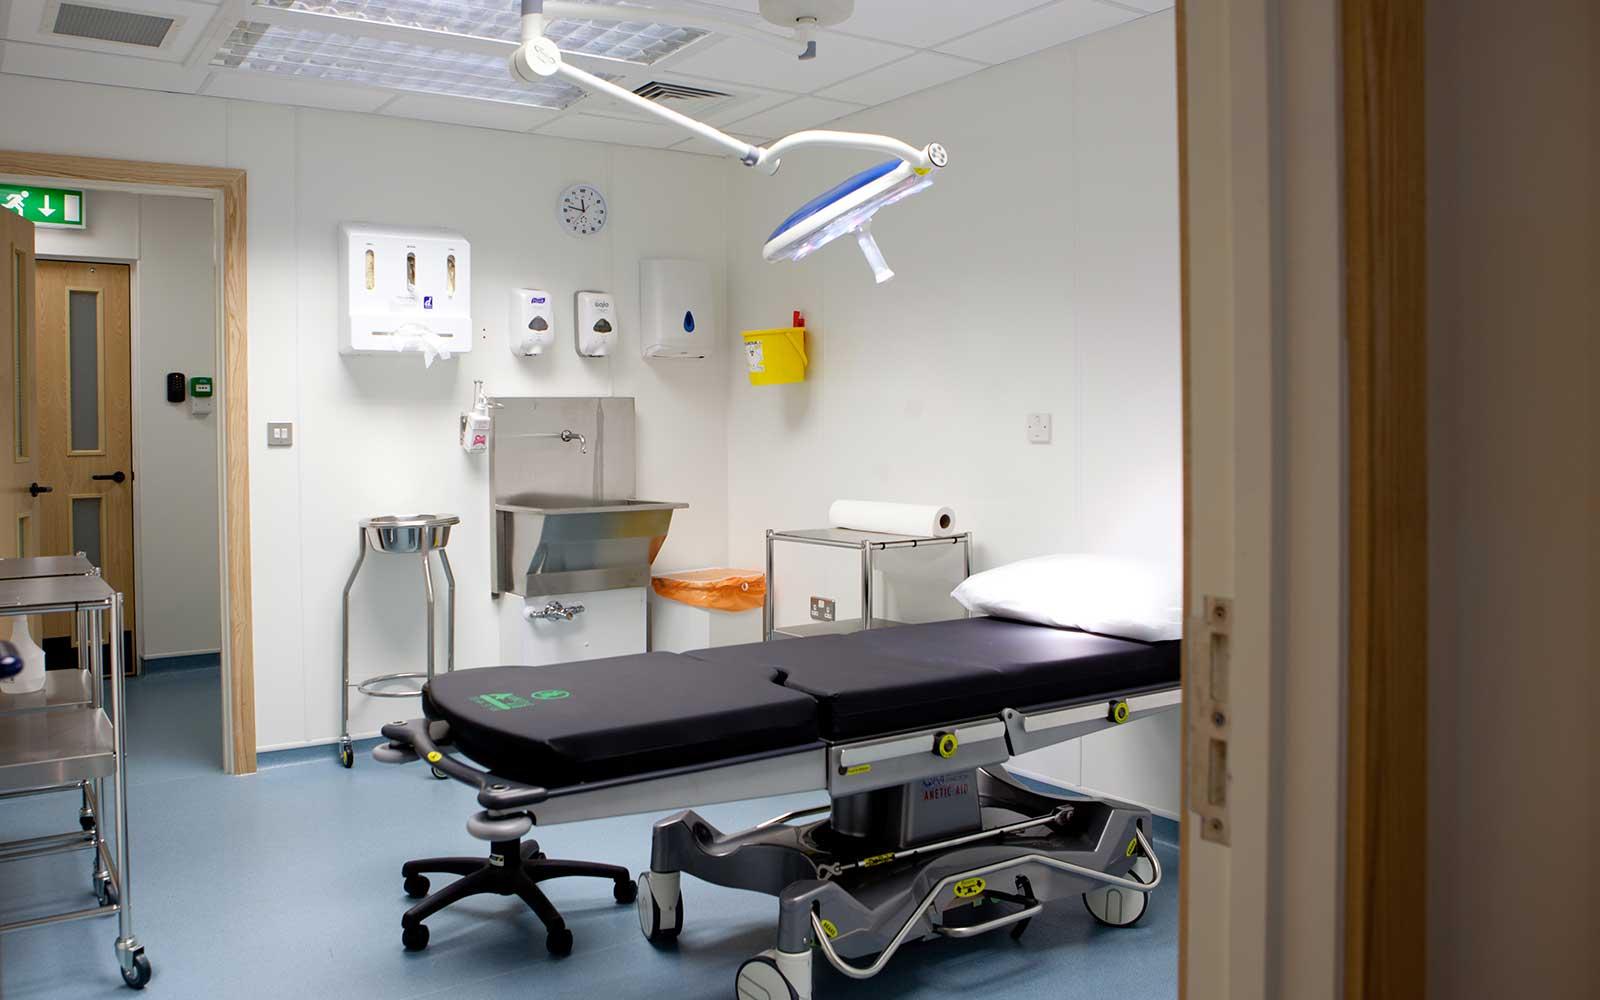 Meneage St Surgery